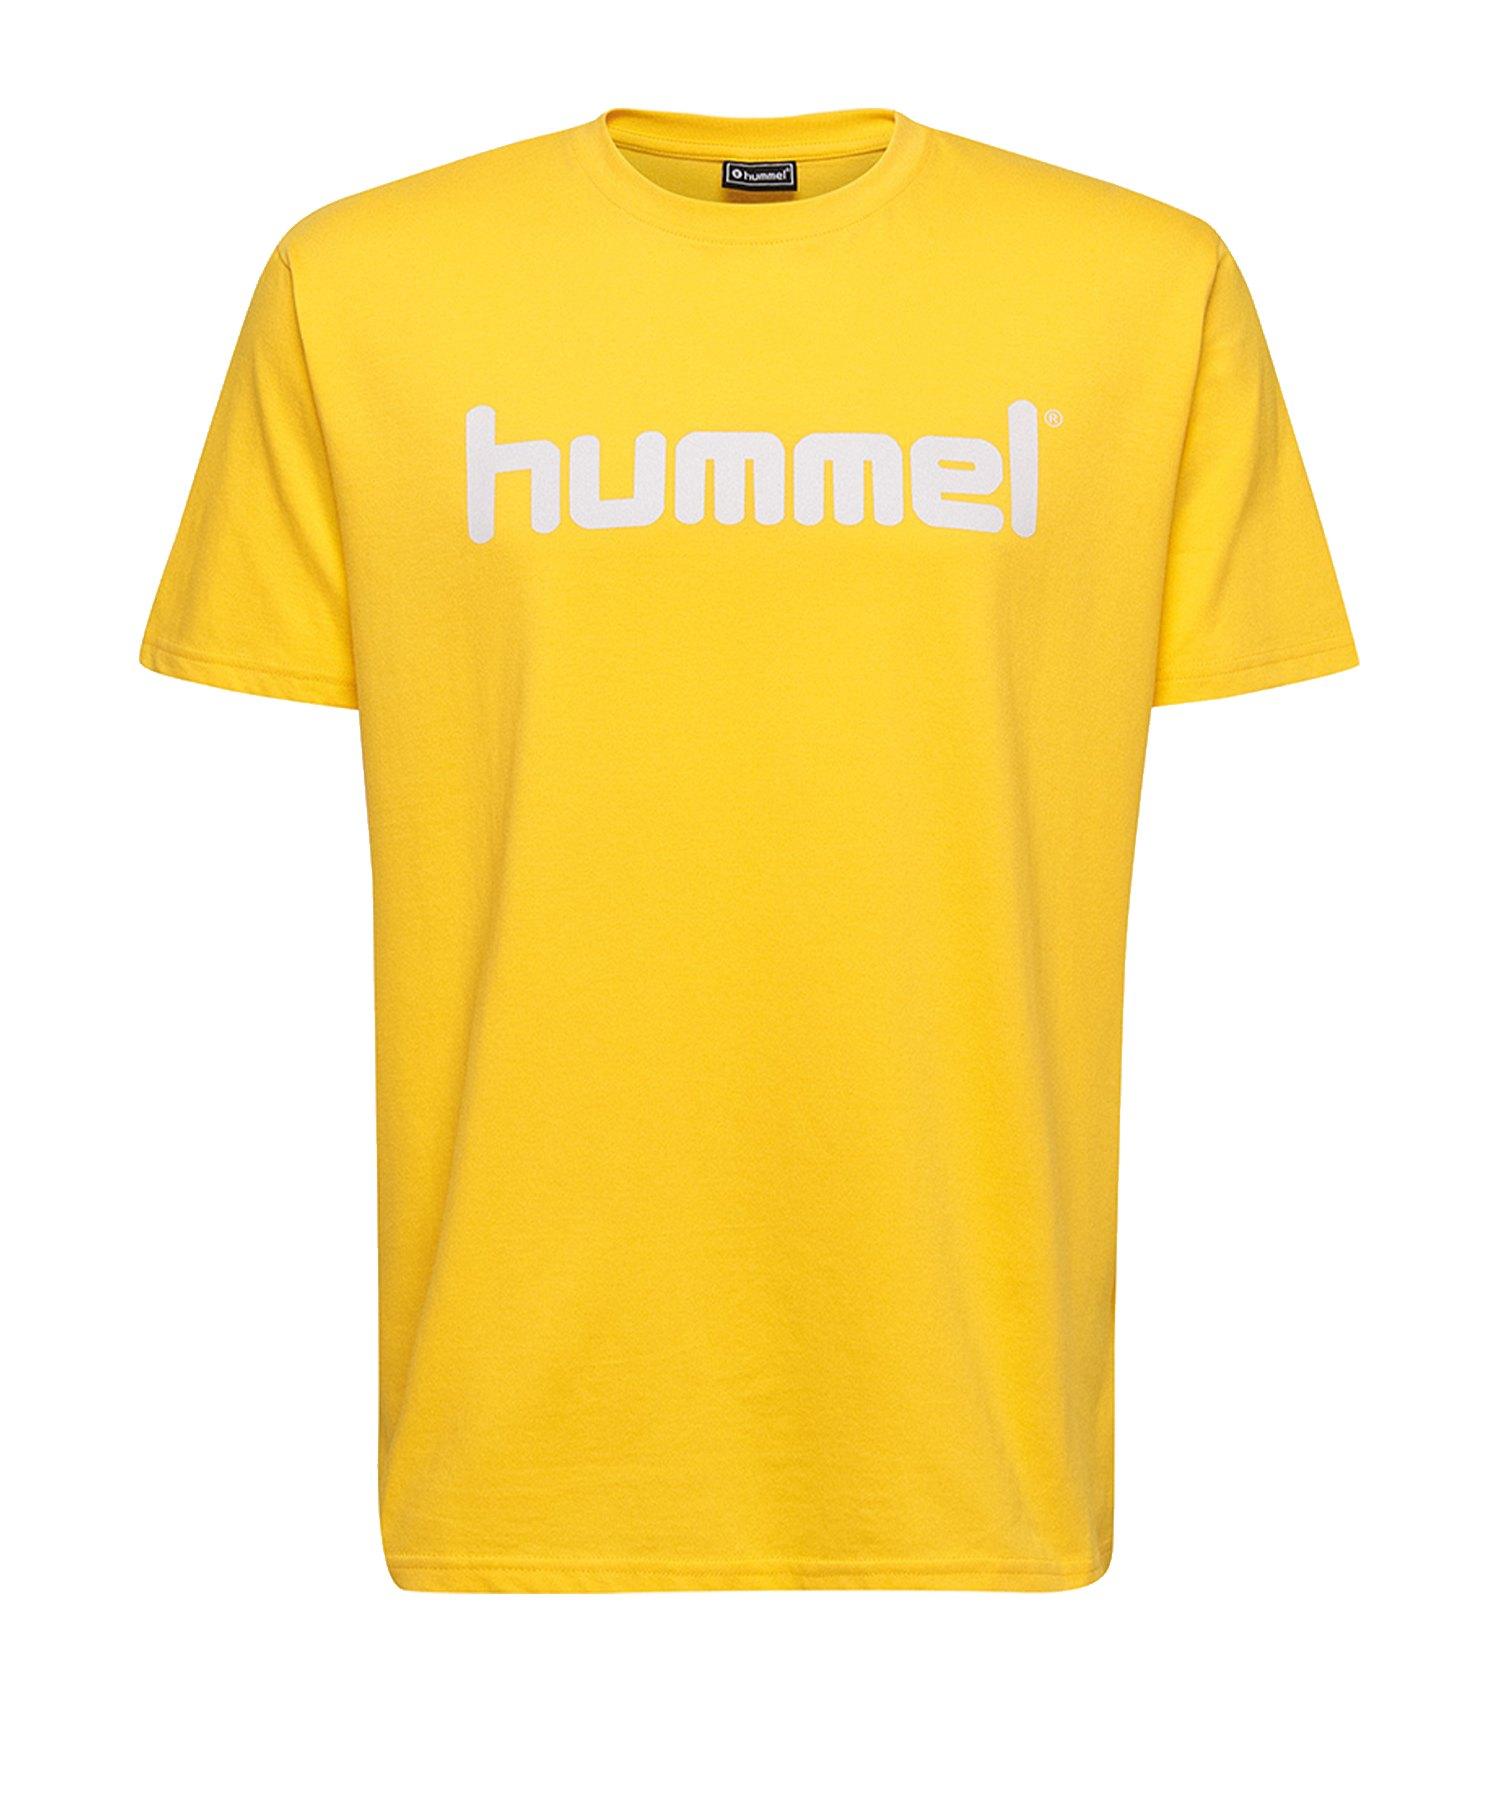 Hummel Cotton T-Shirt Logo Gelb F5001 - Gelb